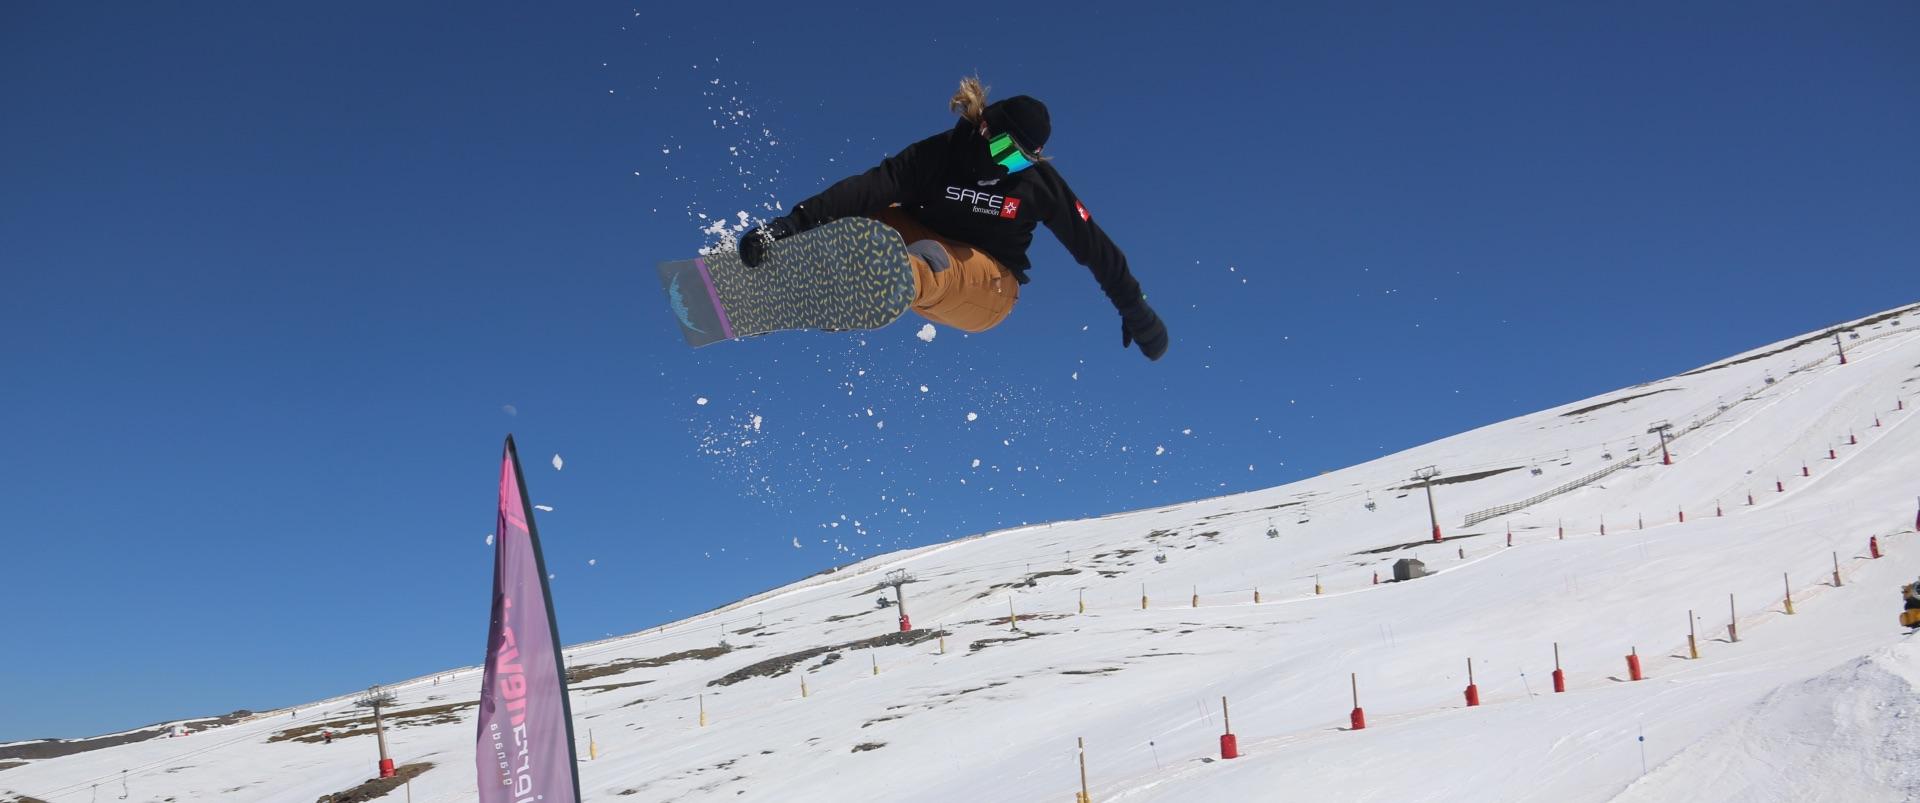 safe-formacion-tecnicos-deportivos-snowboard-les-deux-alpes